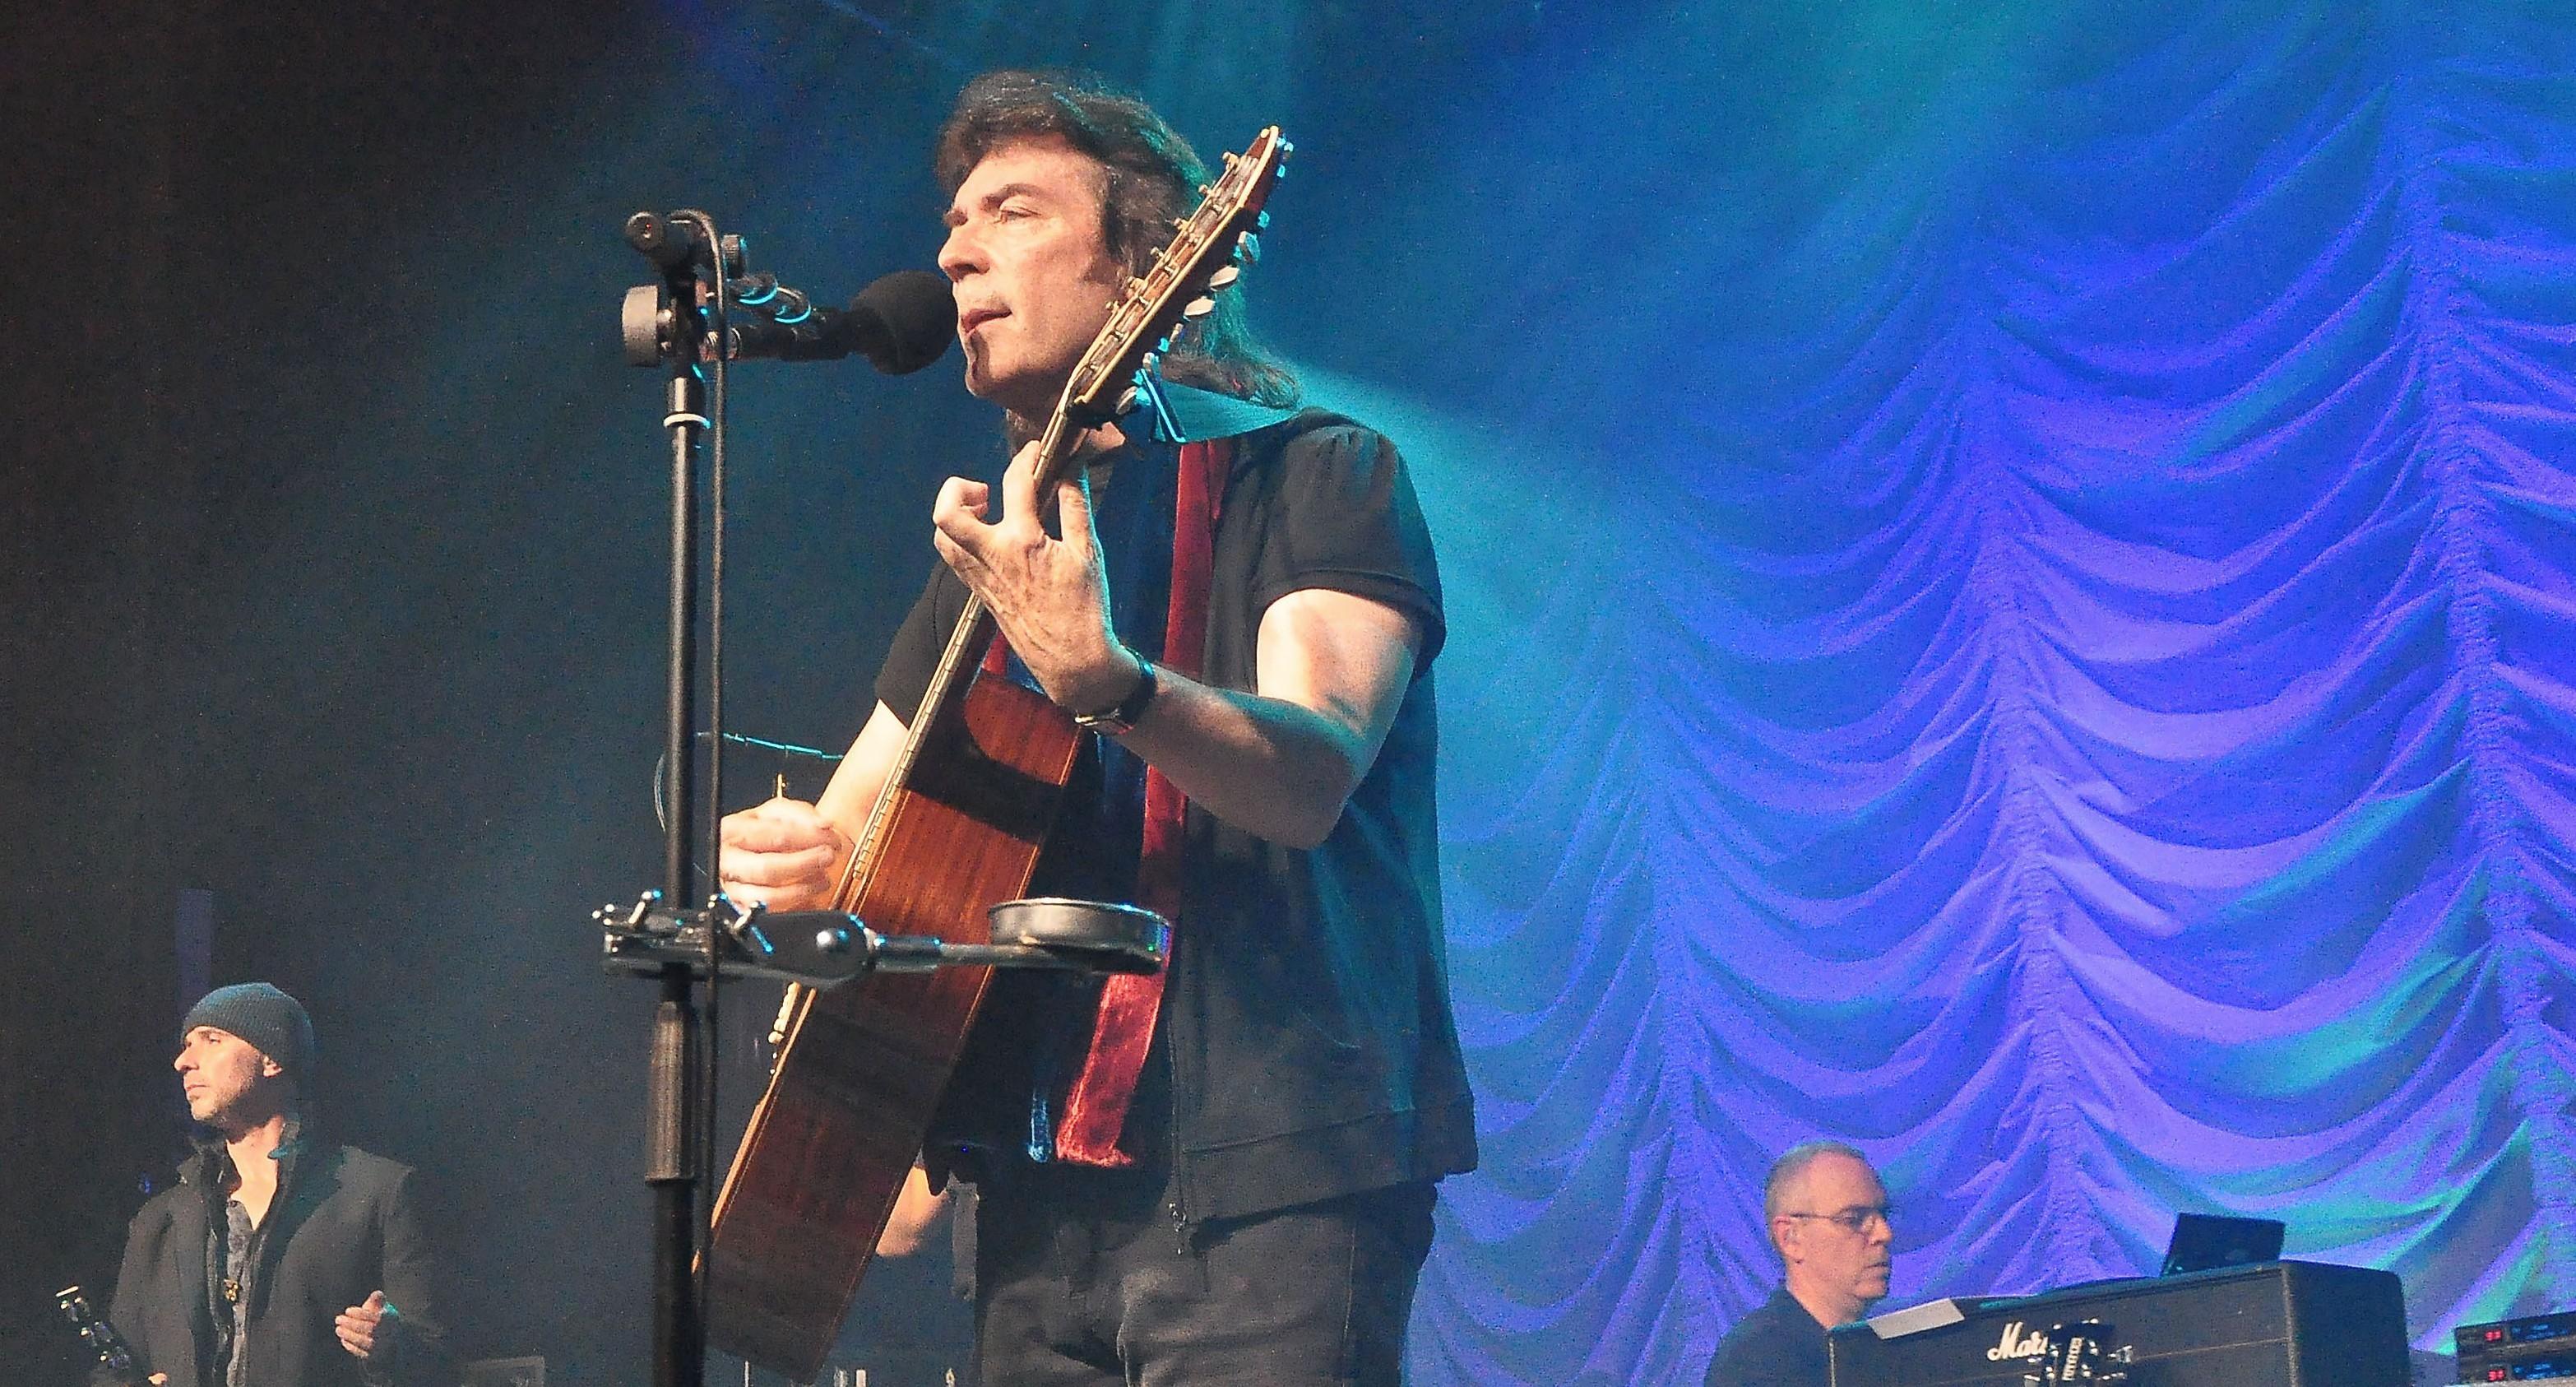 Former Genesis guitarist Steve Hackett is to play Aberdeen's Music Hall tonight